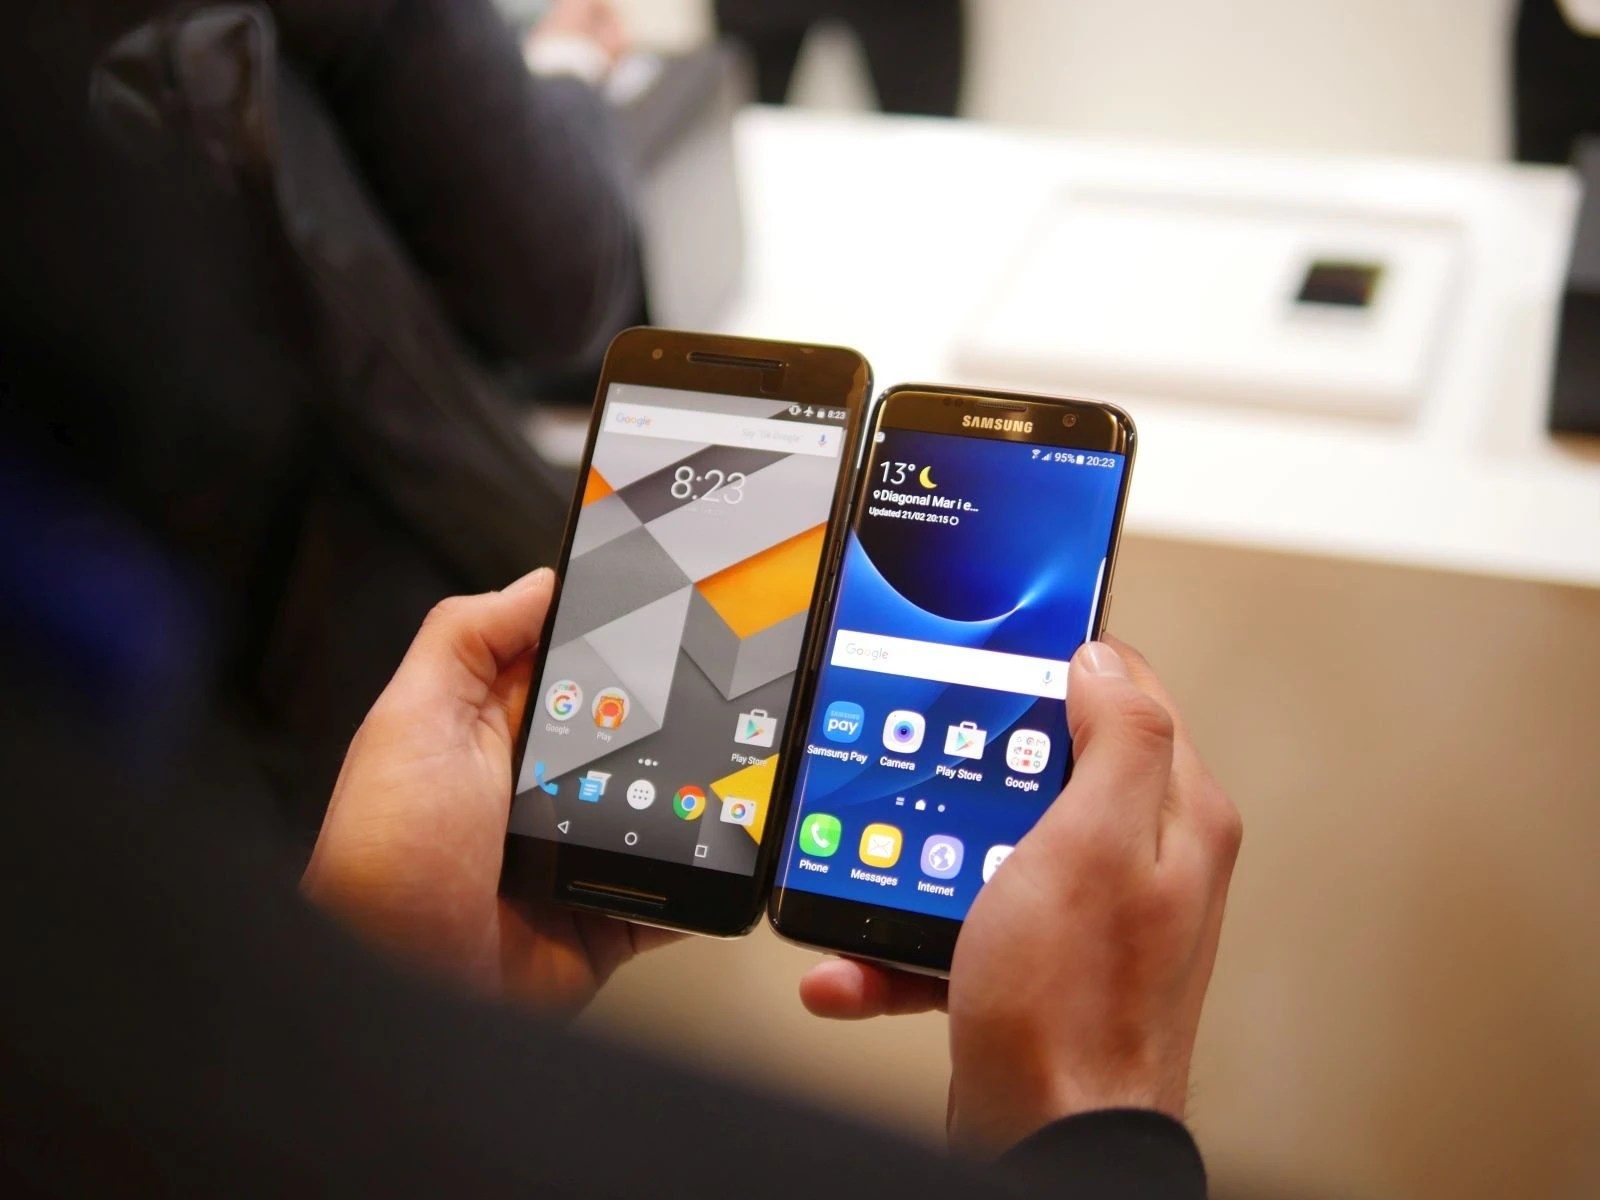 Noble Samsung Galaxy Edge Vs Google Nexus Look Samsung Galaxy Edge Vs Google Nexus Look Phonearena Galaxy S7 Vs Google Pixel Xl Galaxy S7 Vs Google Pixel Specs dpreview Galaxy S7 Vs Google Pixel